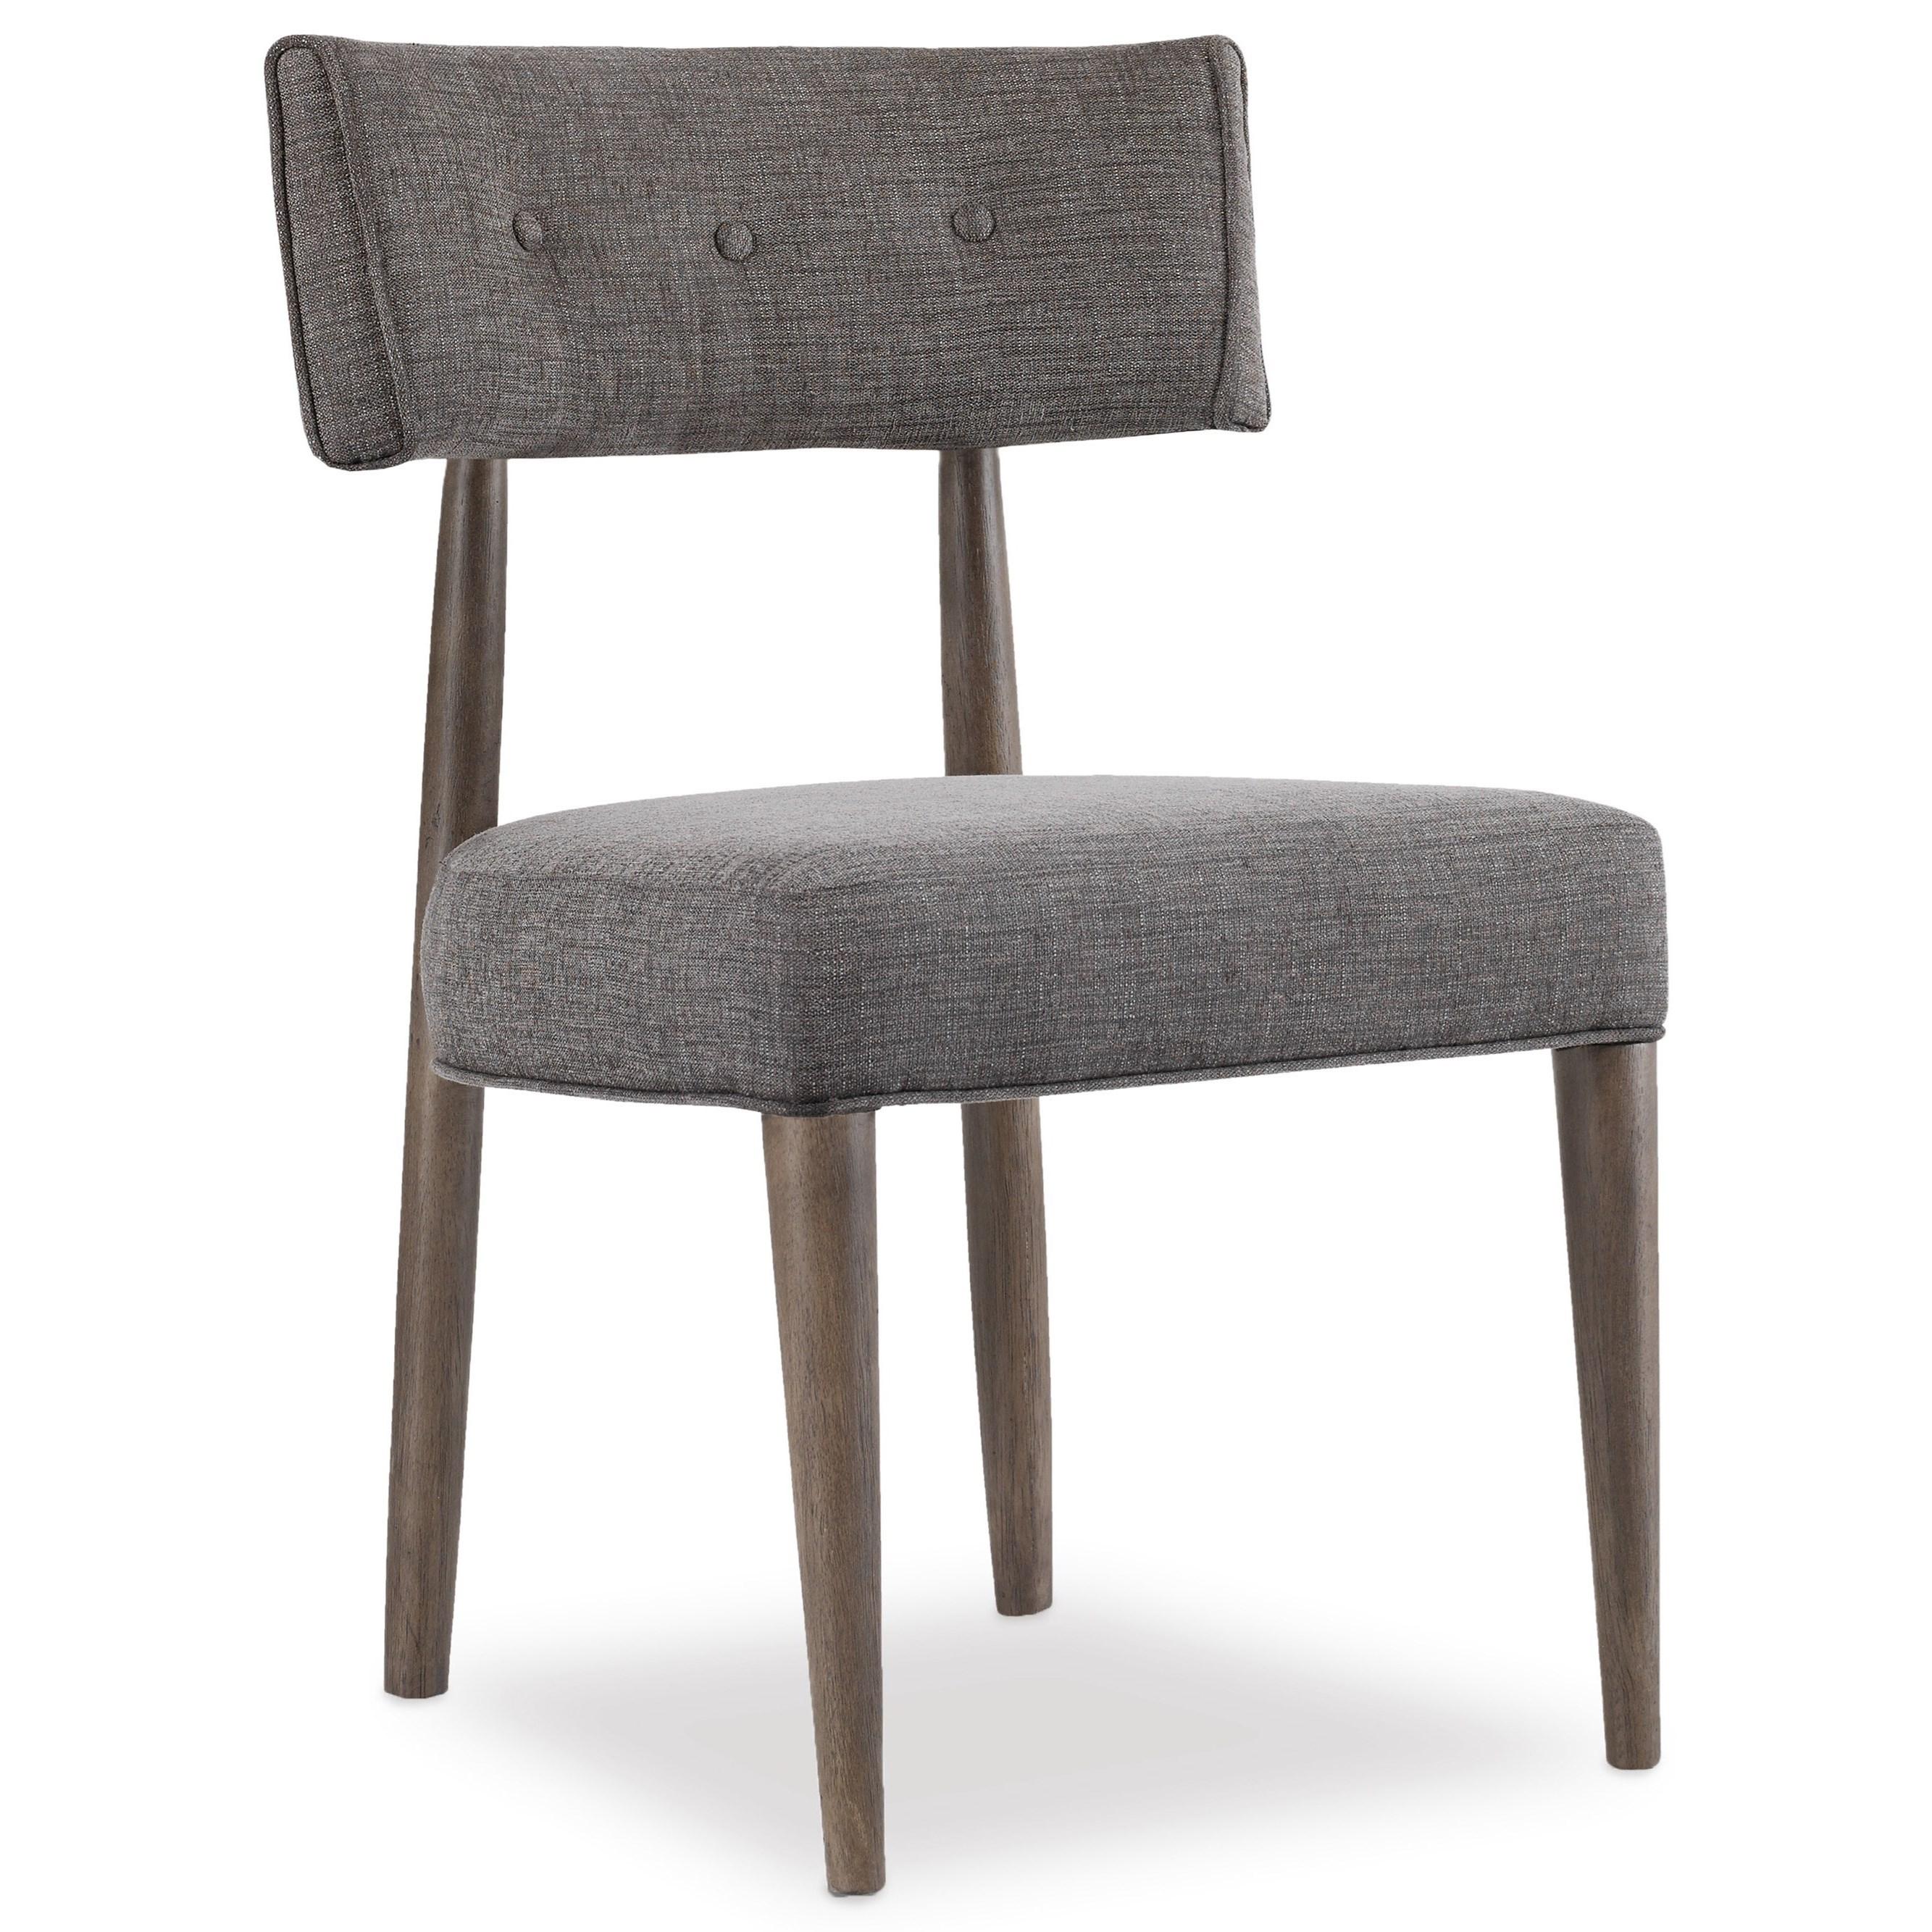 Hooker Furniture Curata 1600 75510 Mwd Modern Upholstered